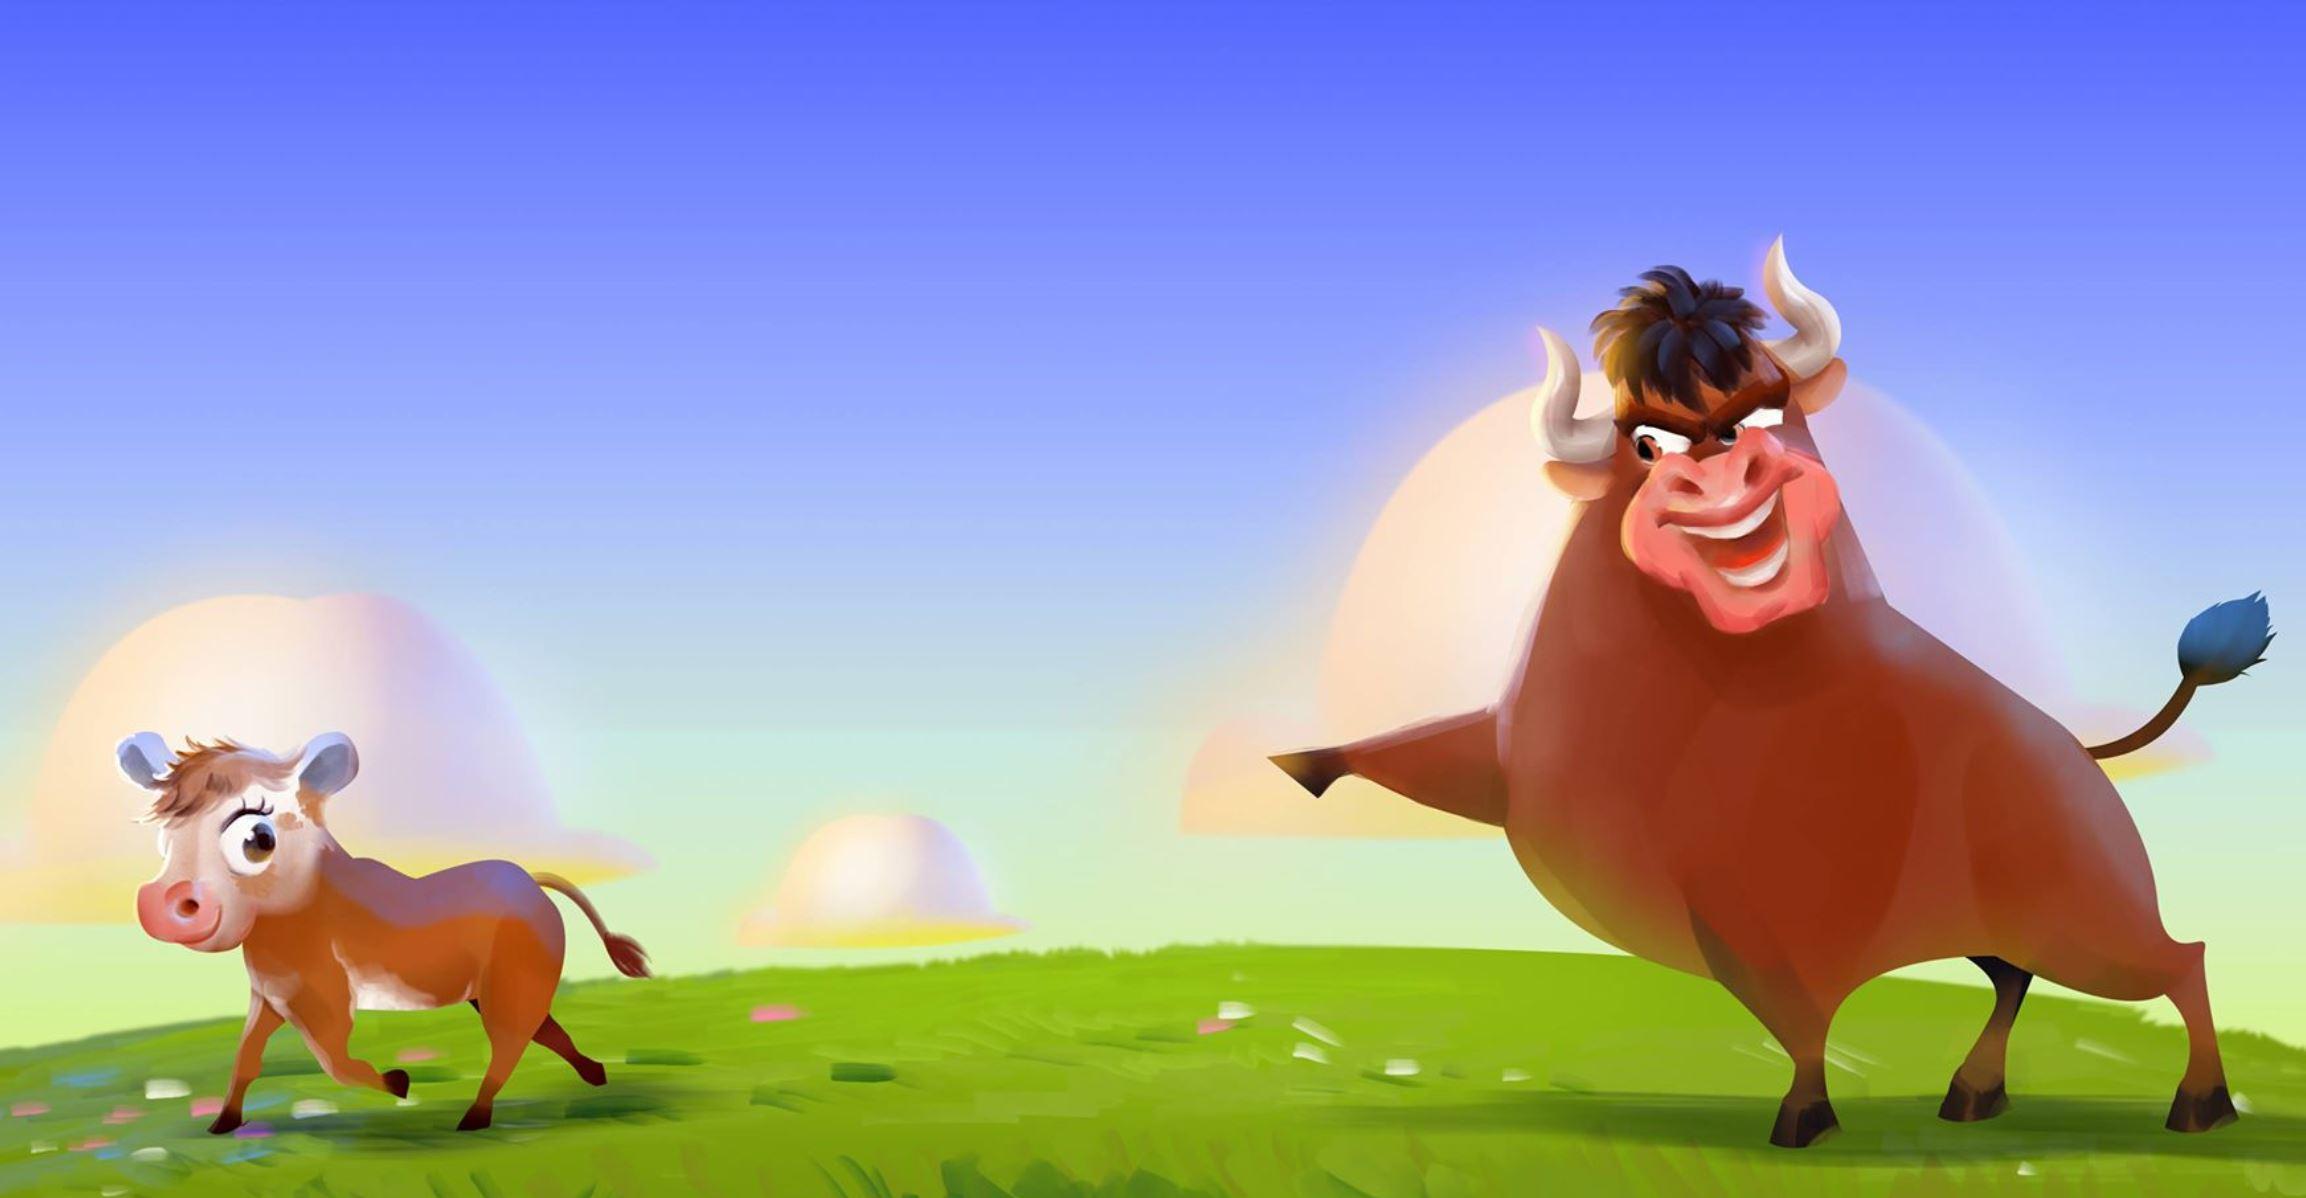 Bully the Bull.JPG